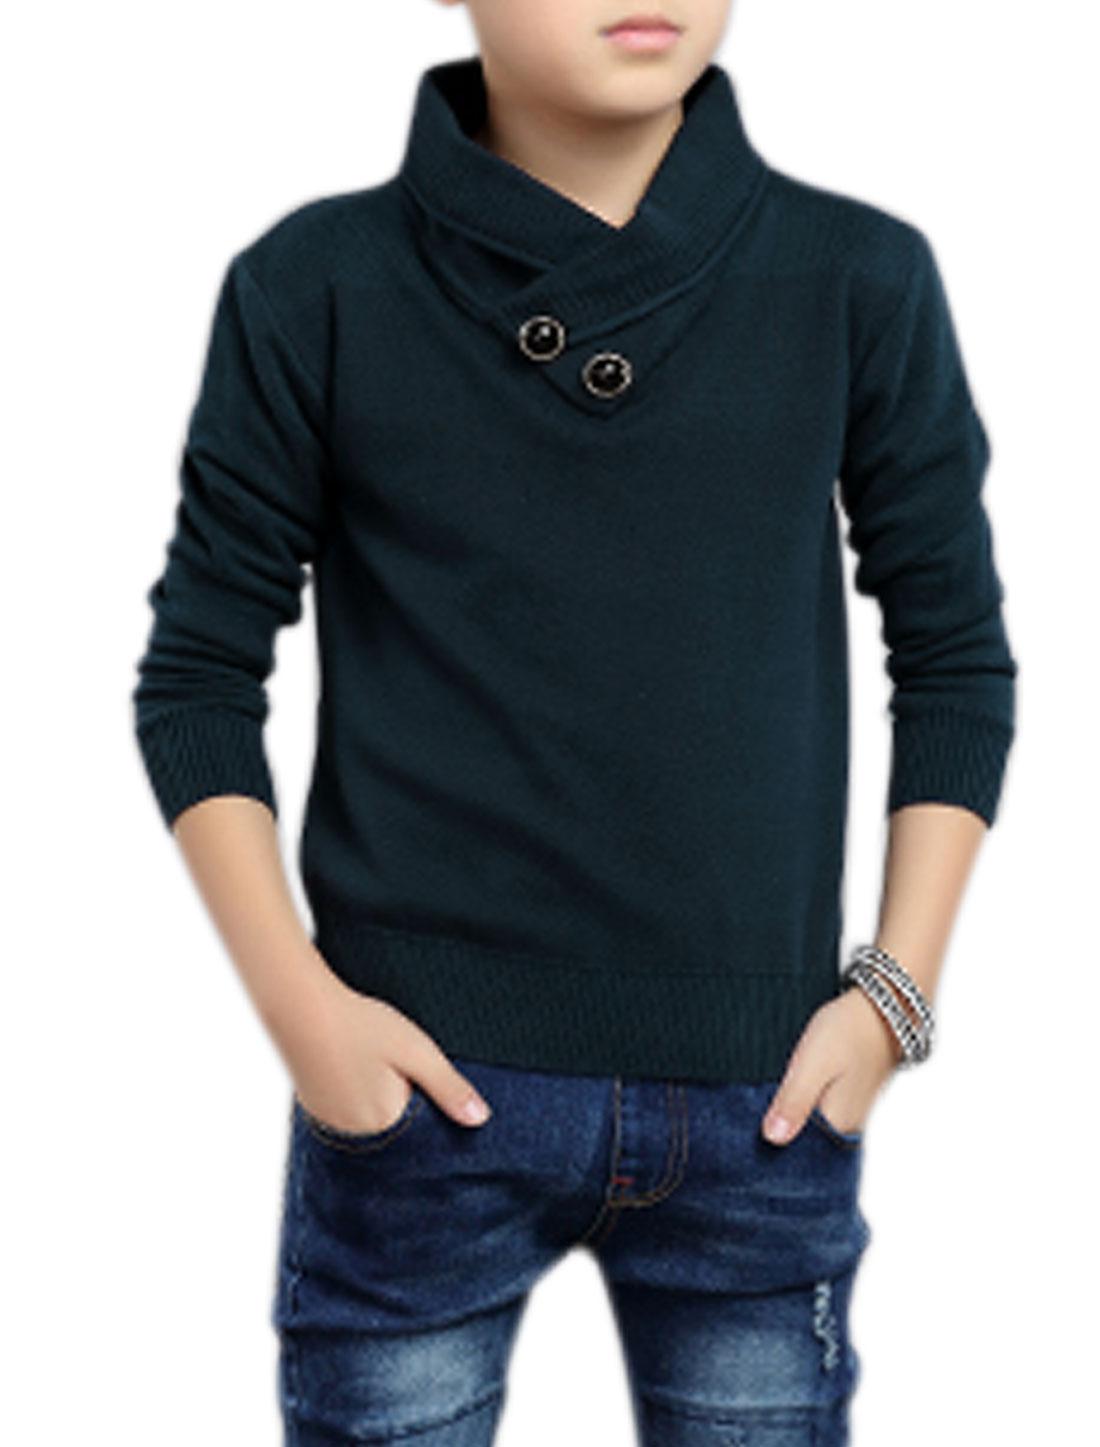 Boys Shawl Collar Buttons Decor Knit Shirt Blue 8